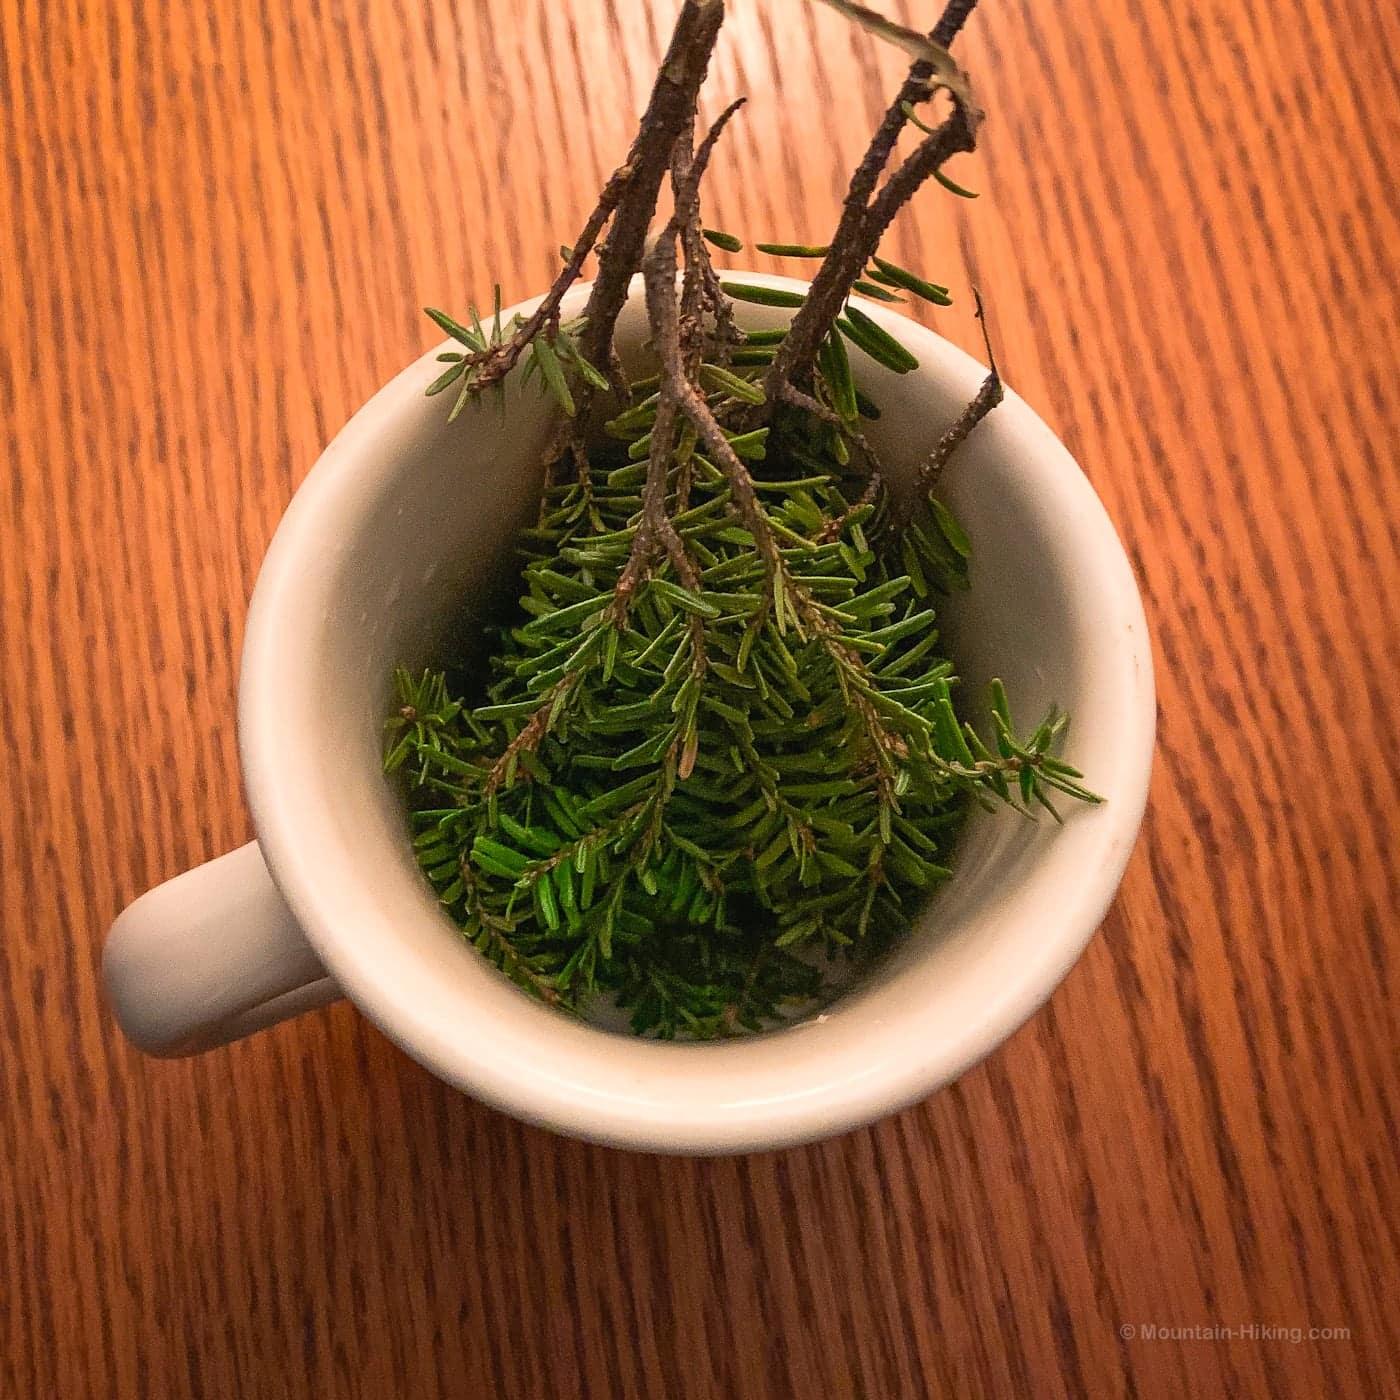 hemlock twigs and needles in a mug